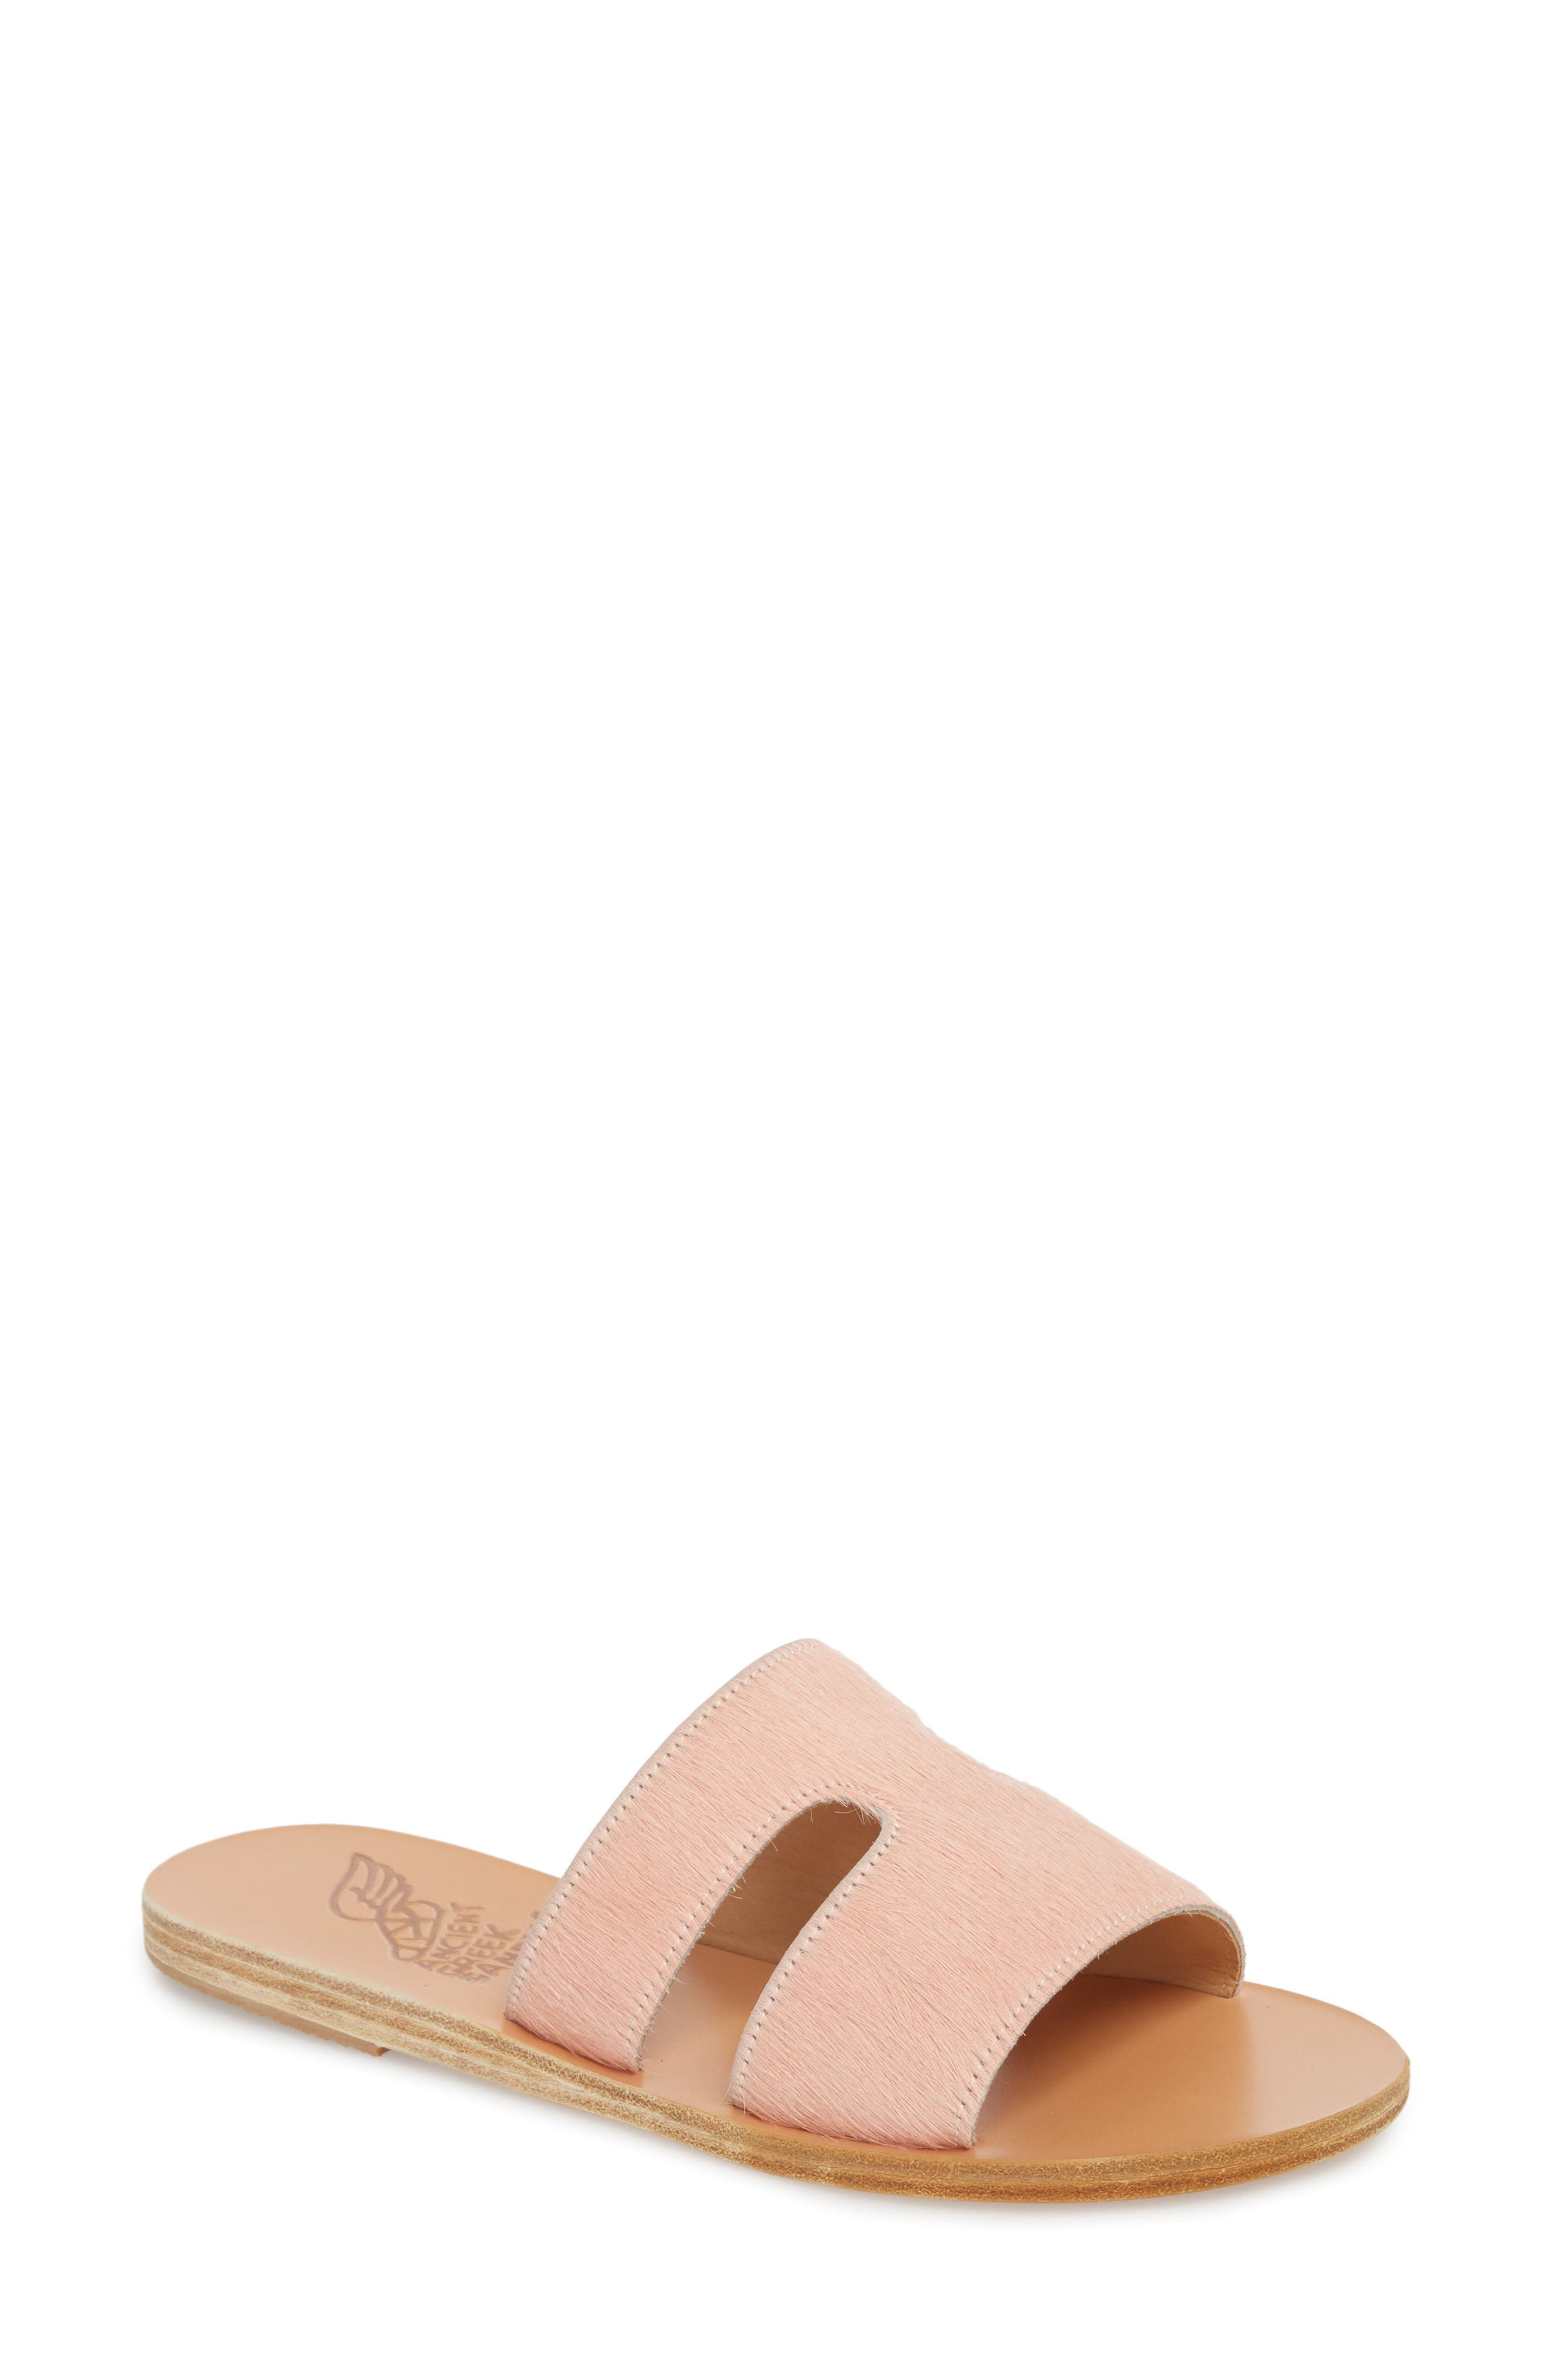 Apteros Genuine Calf Hair Slide Sandal,                             Main thumbnail 1, color,                             Pink Pony